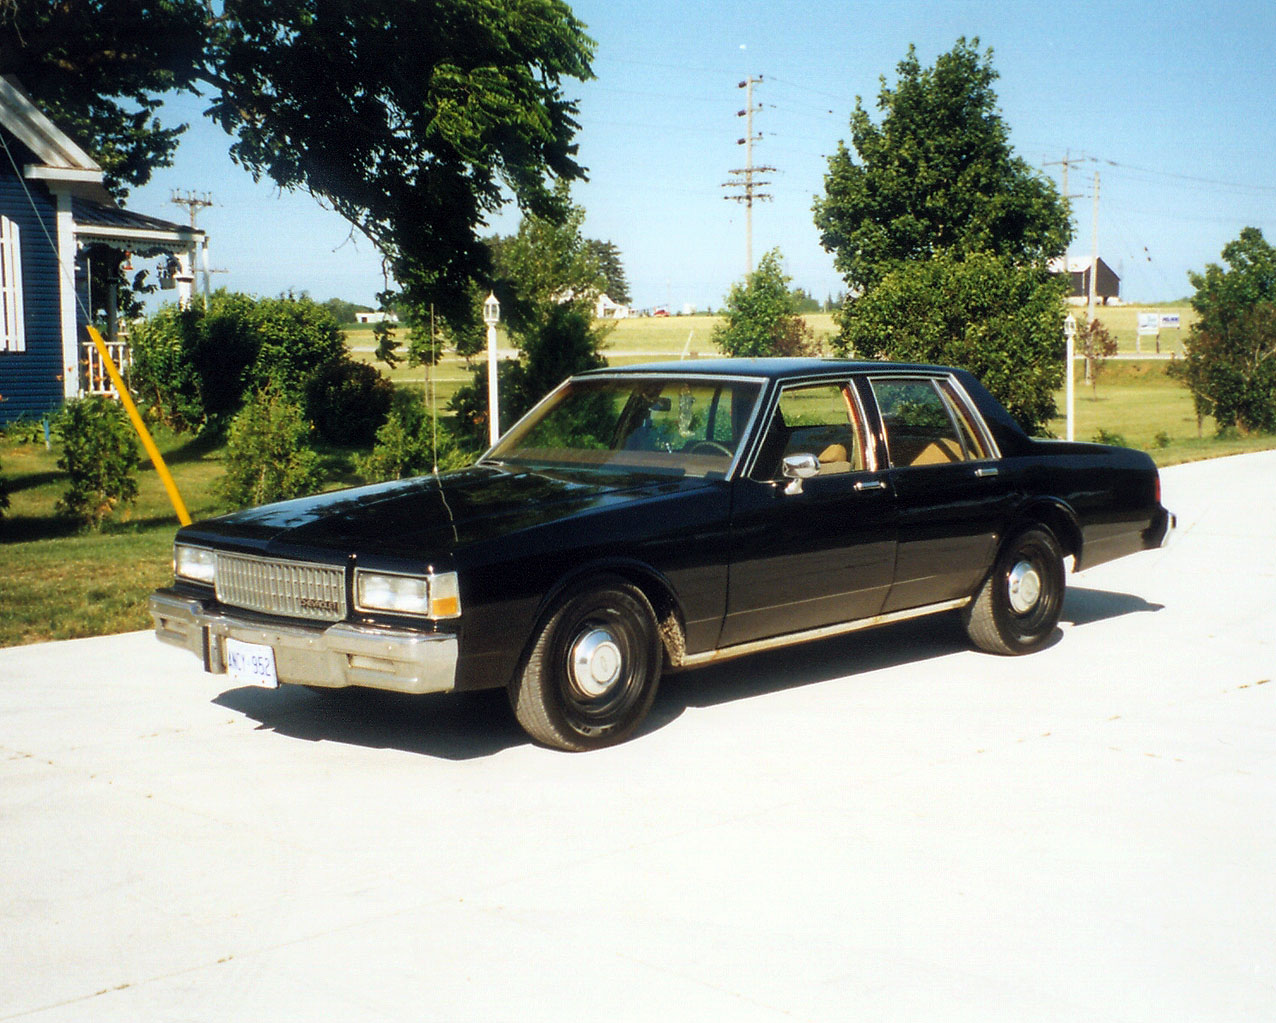 1988 chevrolet caprice police cruiser